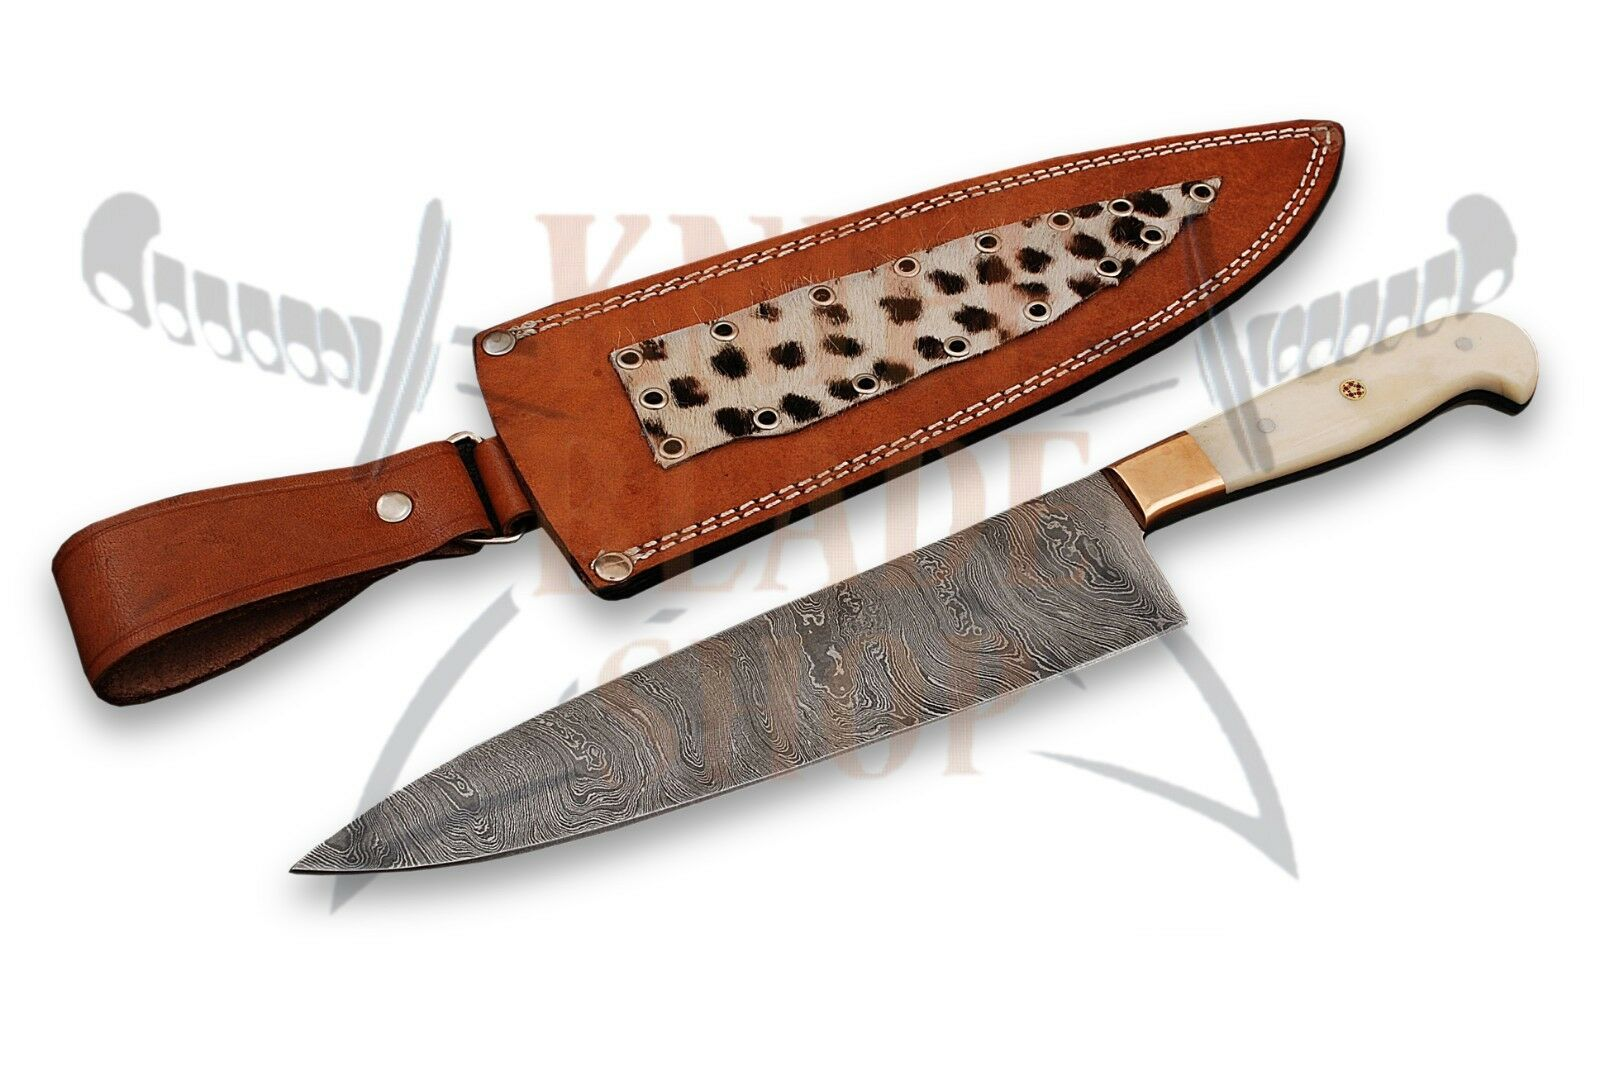 Damascus steel BLADE  KITCHEN KNIFE CHEF KNIFE SMOOTH BONE HANDLE